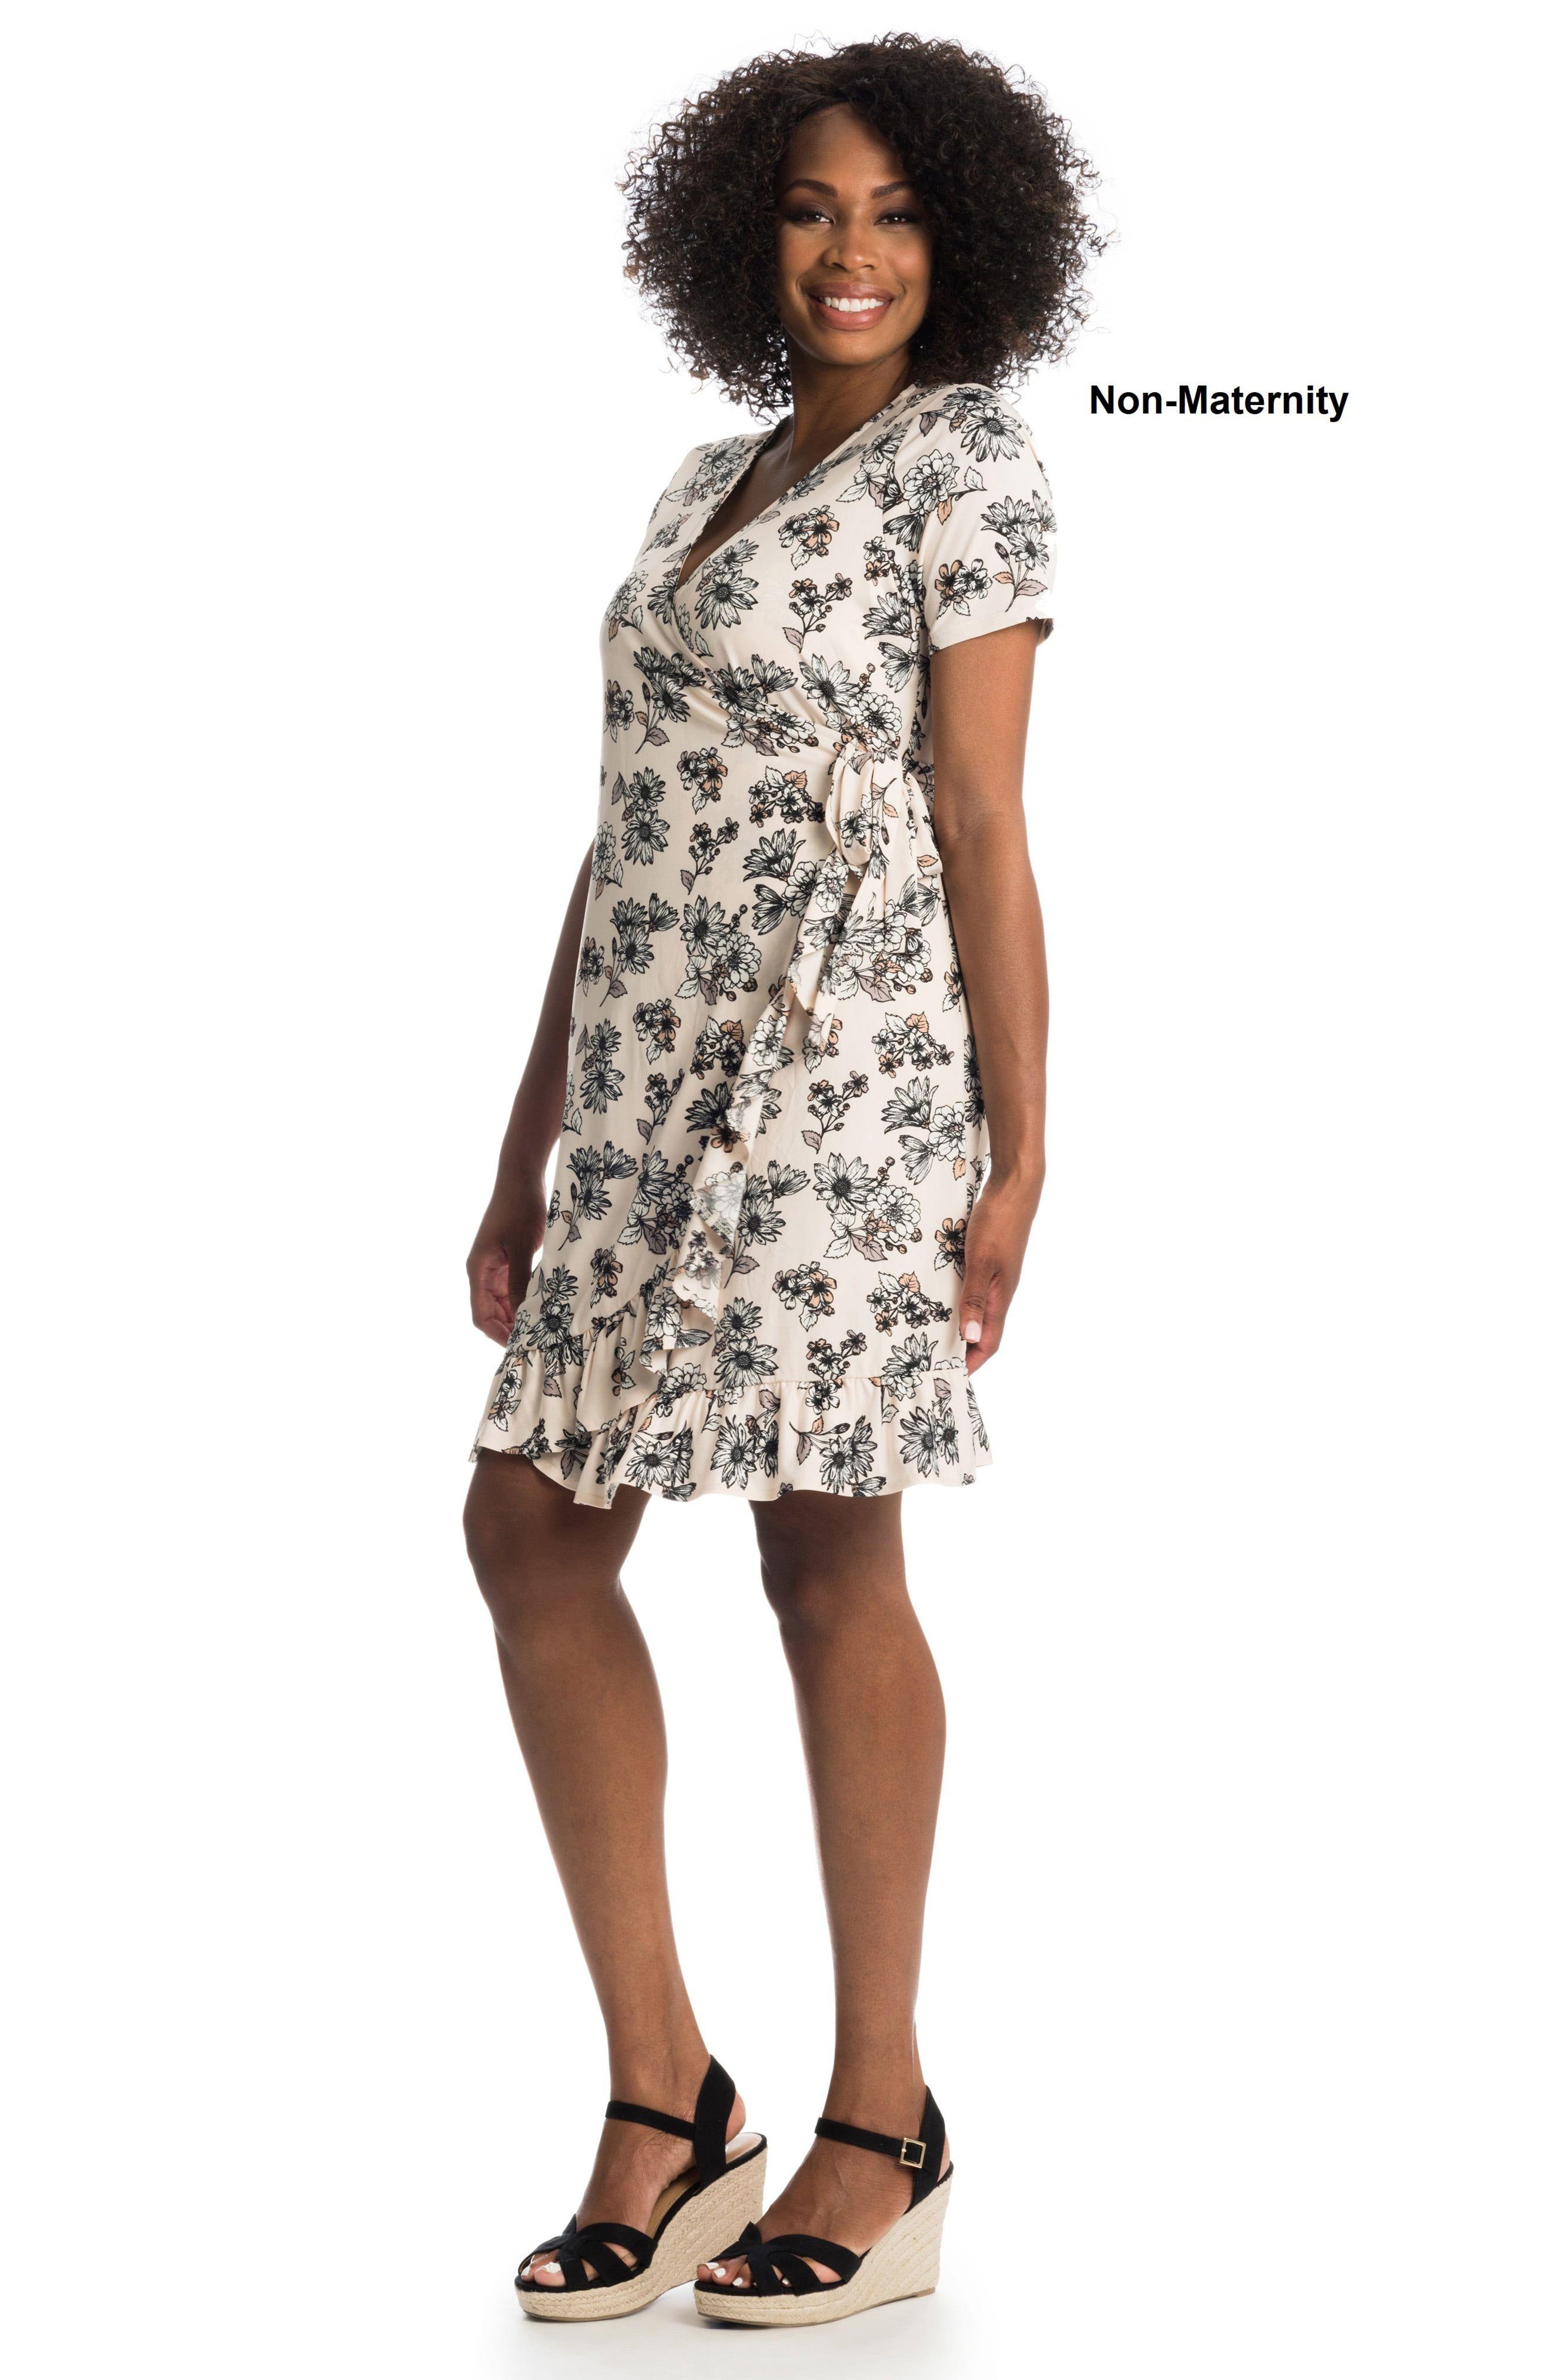 Everly Grey Araceli Maternity Nursing Wrap Dress Nordstrom In 2021 Wrap Dress Everly Grey Jersey Wrap Dress [ 4048 x 2640 Pixel ]